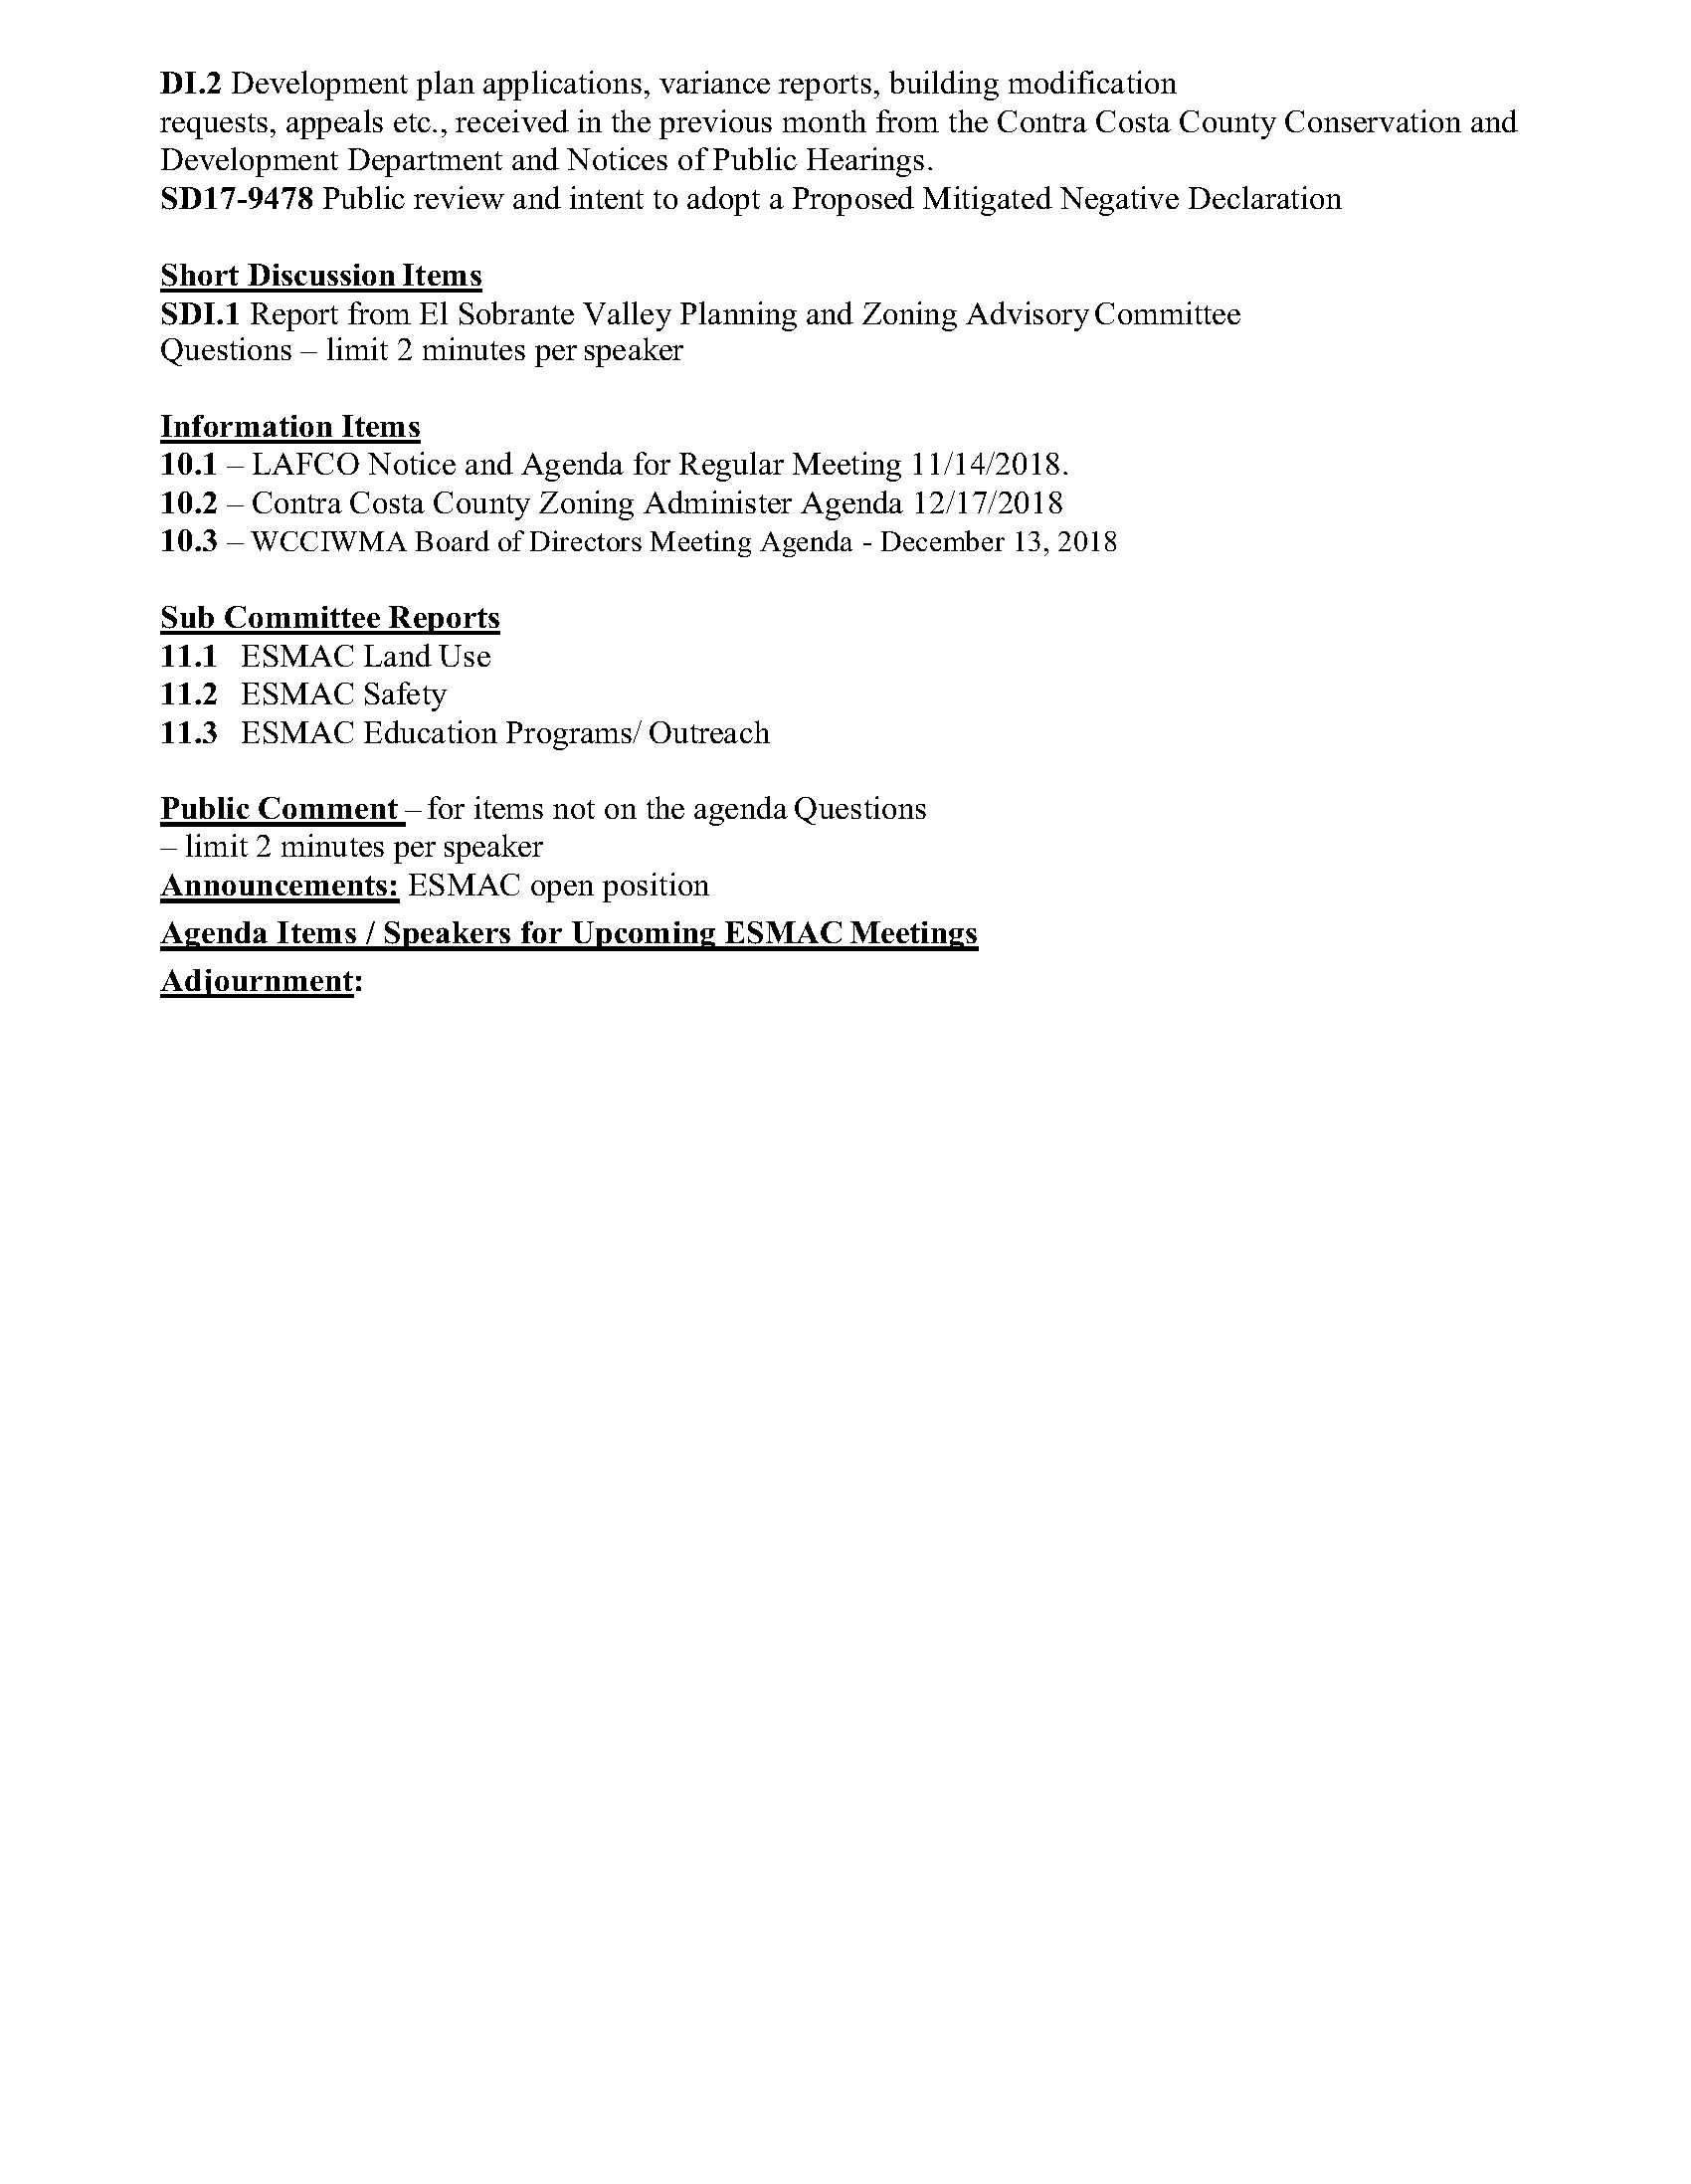 ESMAC Agenda 1.9.2019 (34 Pages)_2.jpg